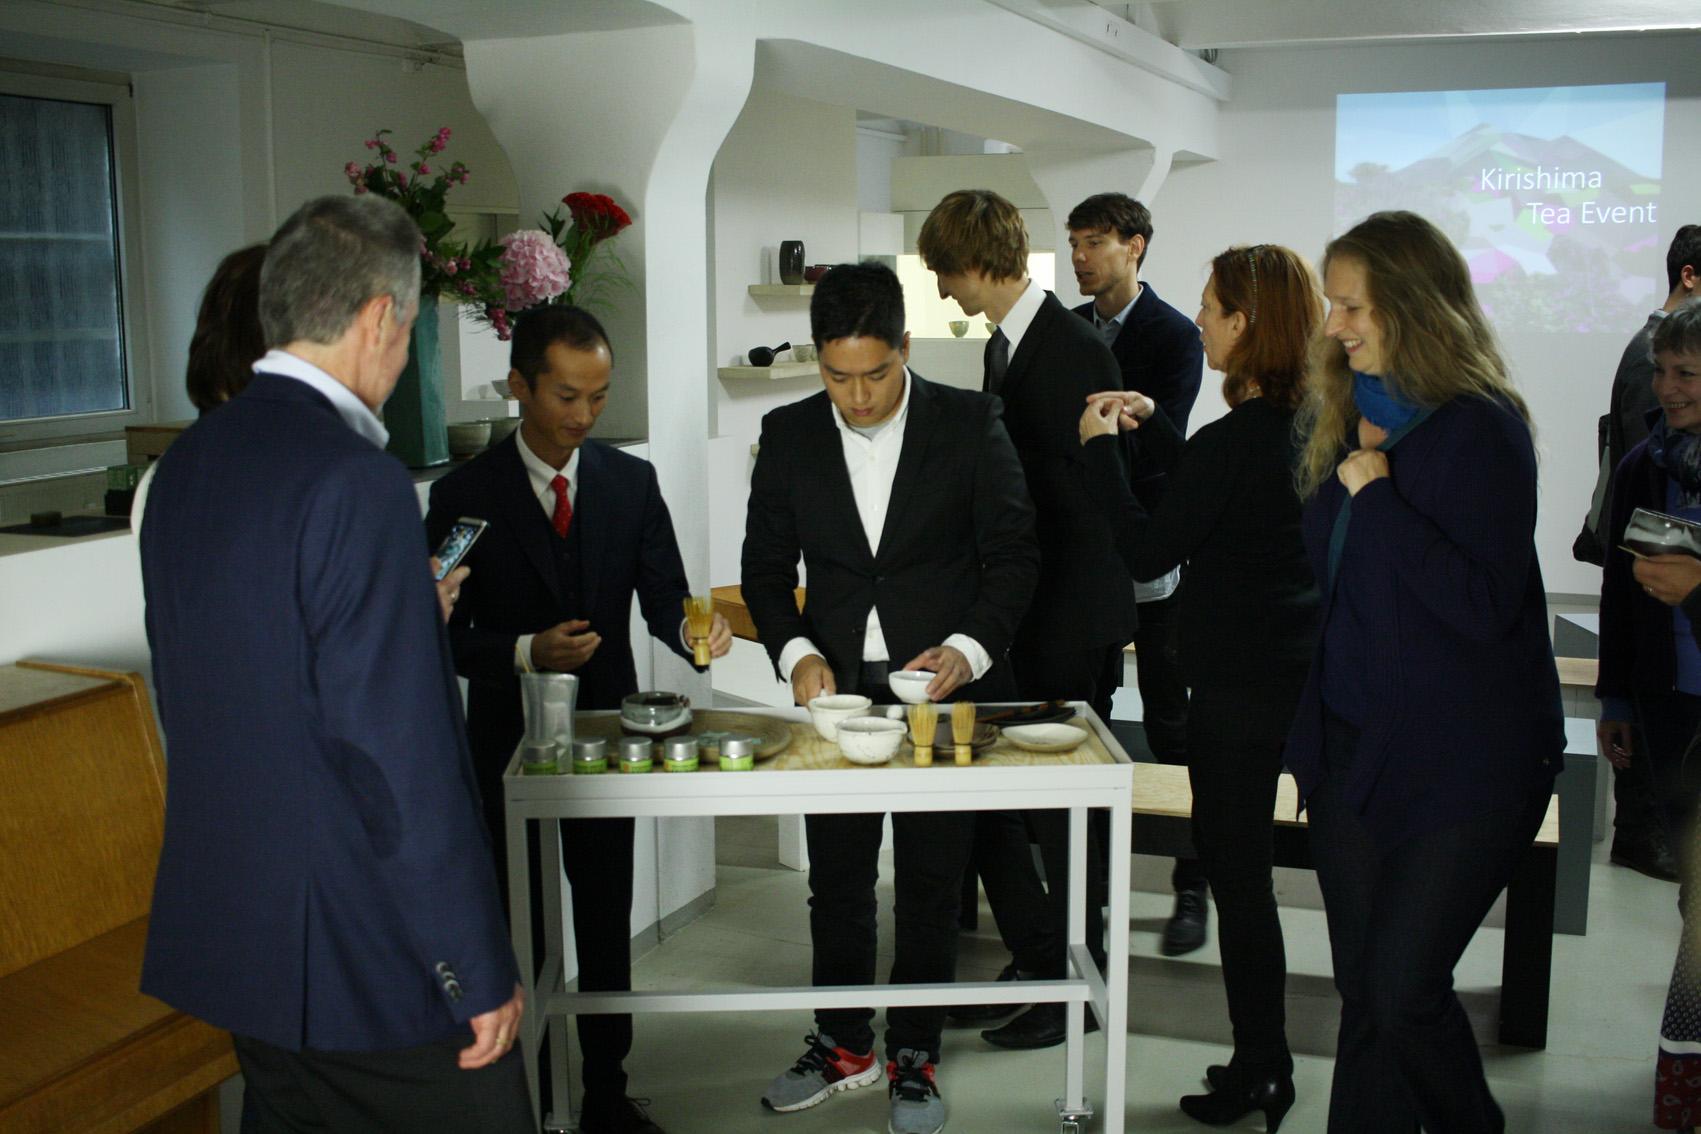 Shutaro and Kenji Hayashi greet our guests with Miumori Kirishima Matcha